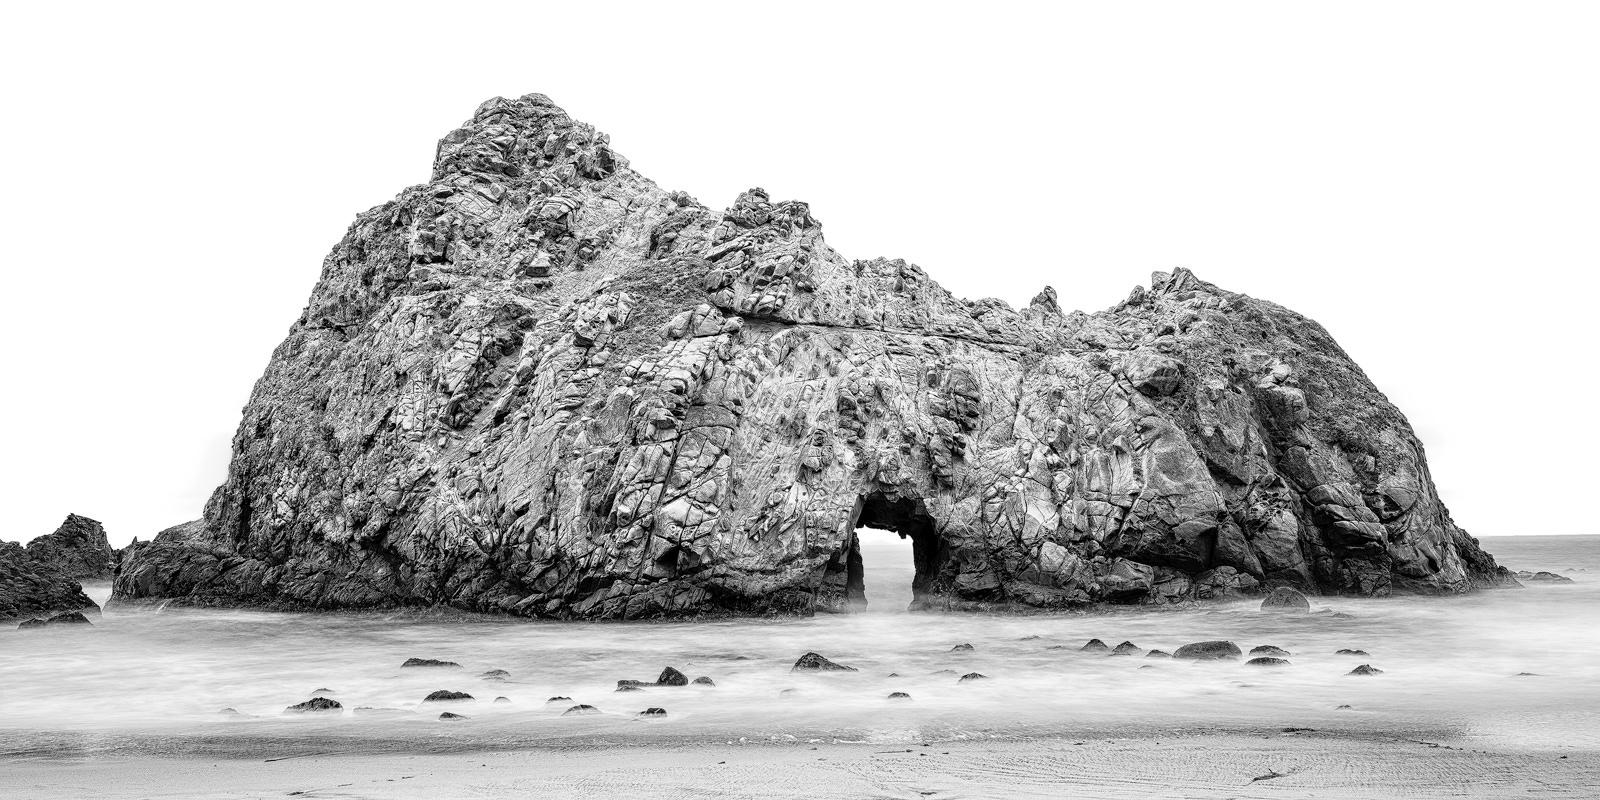 Fine, Art, Limited, Edition, Pfeiffer Beach, Big Sur, State Park, Central Coast, mini Yosemite, nature, rock, architecture, waves, crash, castle, drawbridge, doorway, California, Monterey County, natu, photo